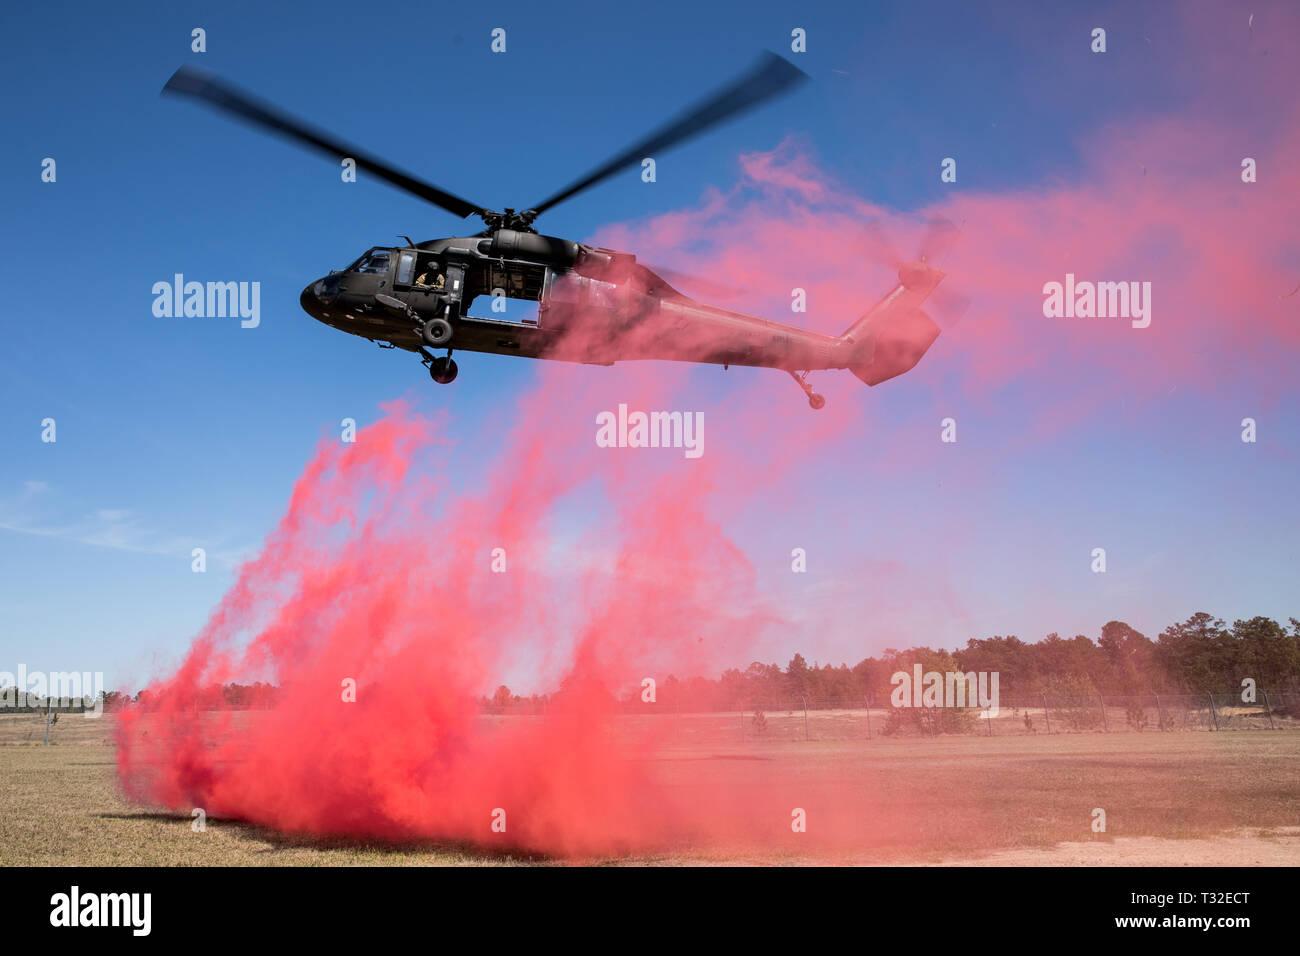 3sfg Stock Photos & 3sfg Stock Images - Alamy